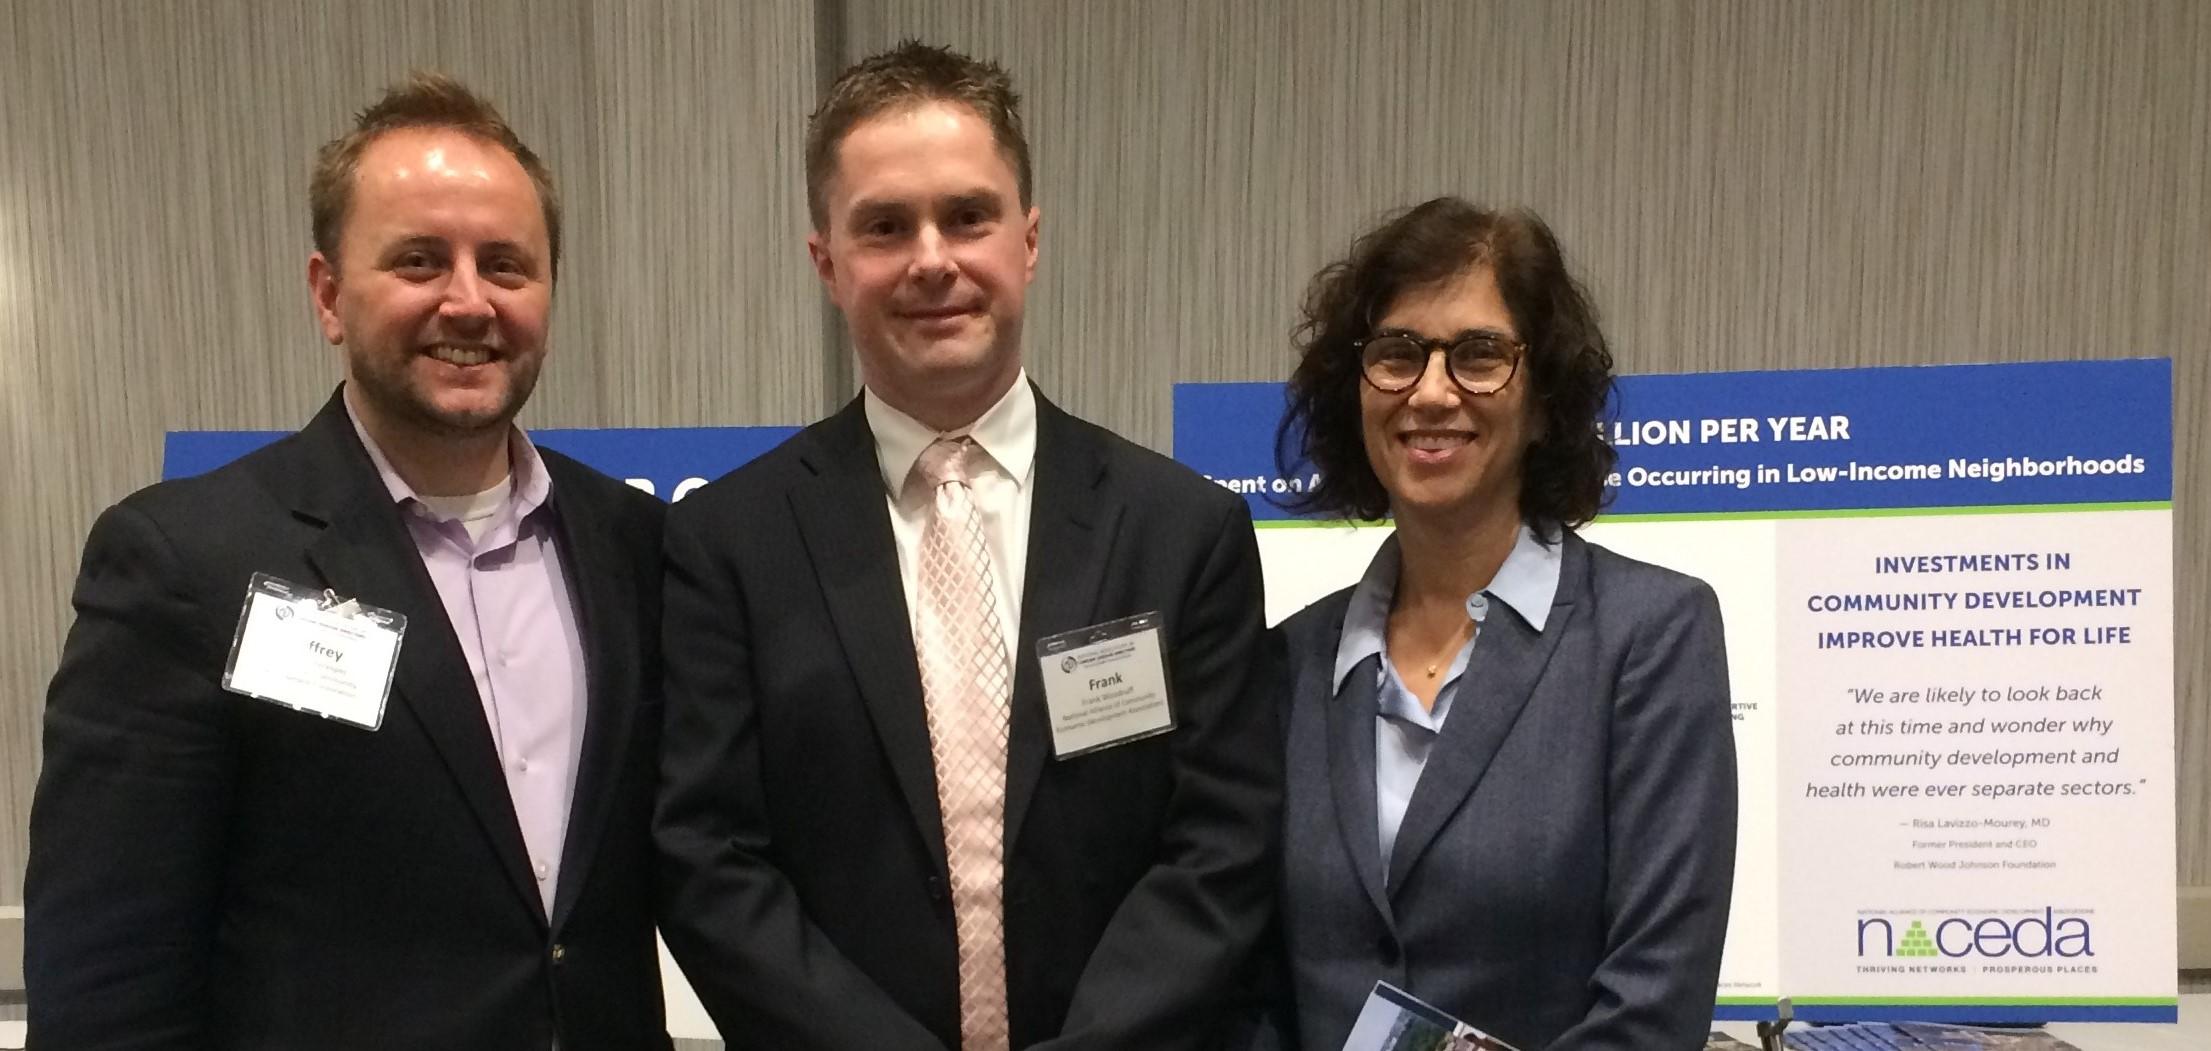 Jeff Verespej, Karen Hacker and Frank Woodruff at NACDD Public Health Showc